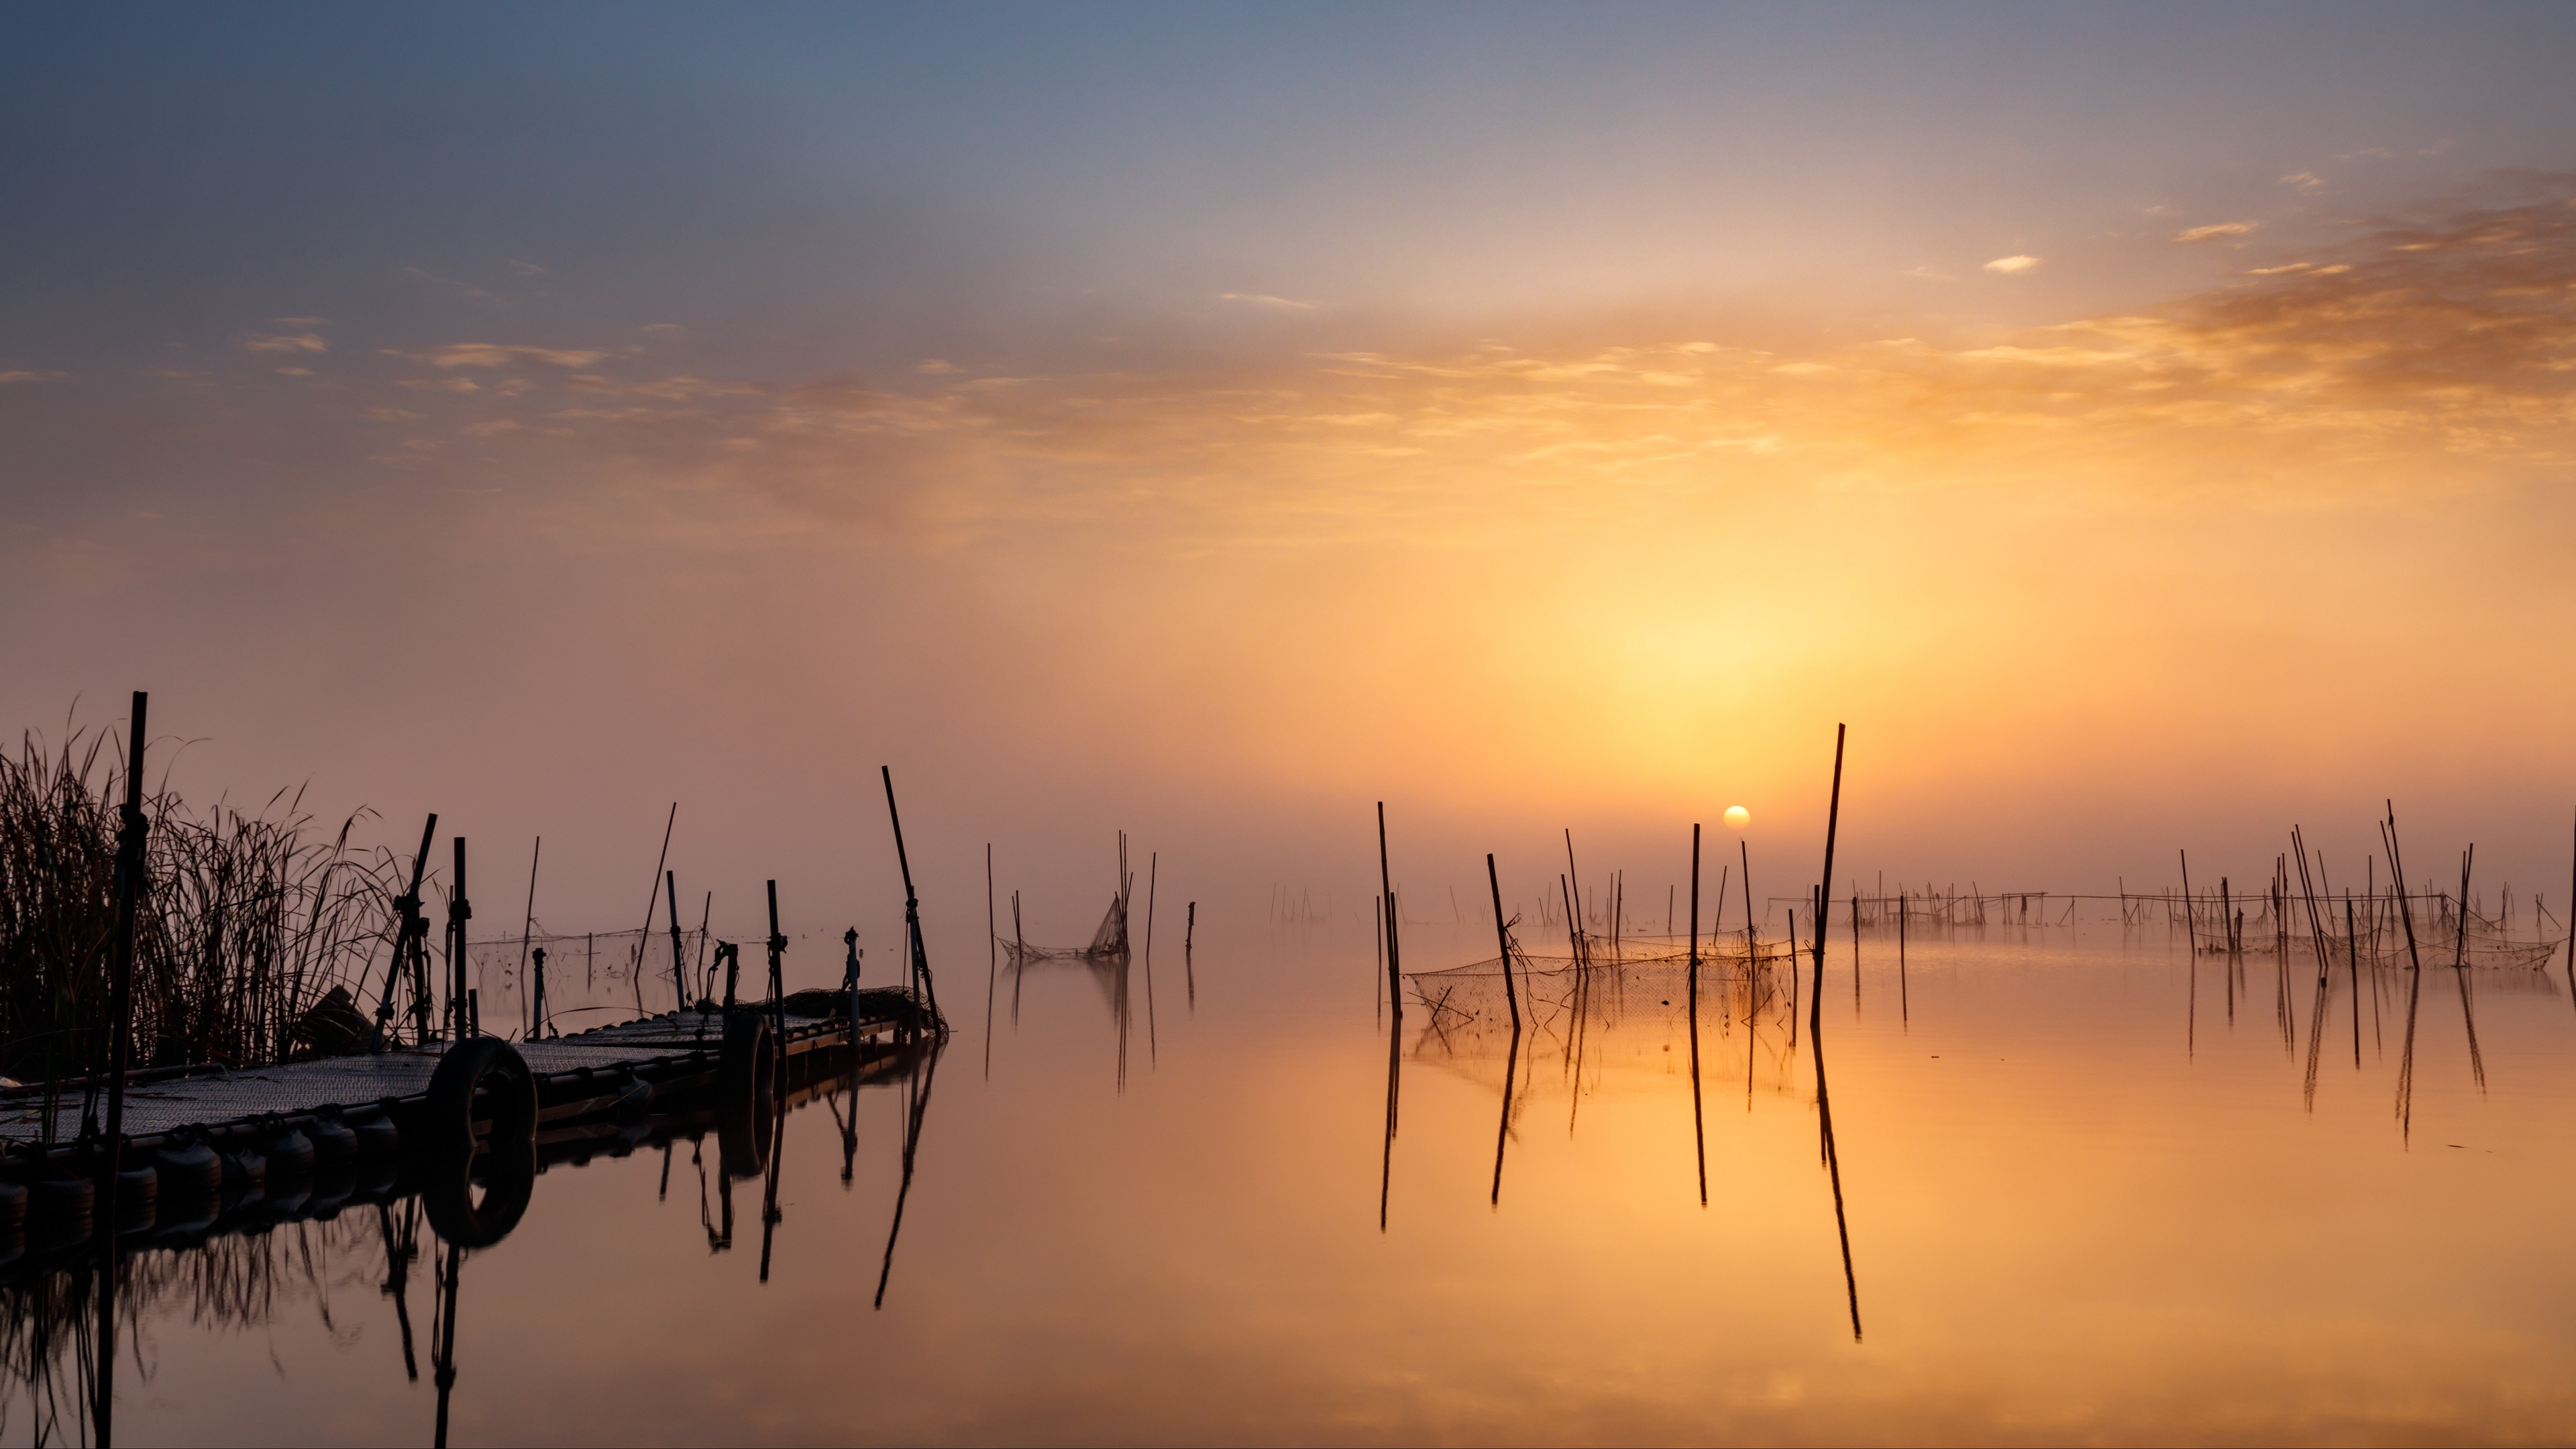 pier sunset lake fishing nets 4k 1541117189 - pier, sunset, lake, fishing nets 4k - sunset, pier, Lake